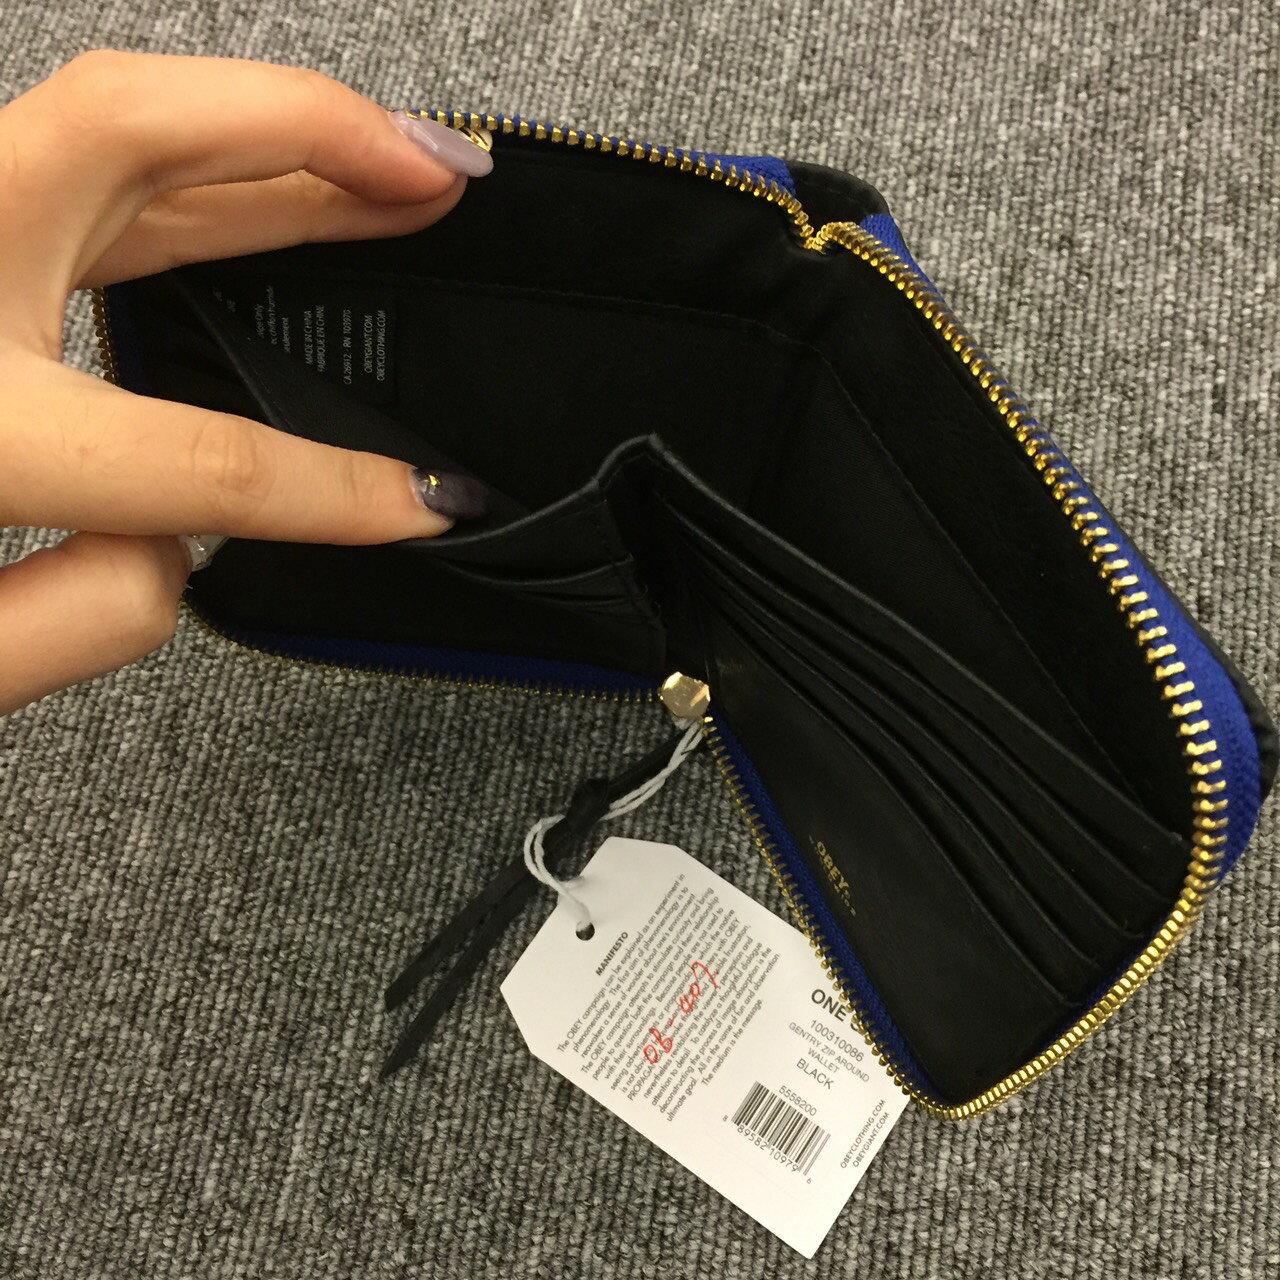 BEETLE 美國品牌 OBEY GENTRY ZIP AROUND WALLET 全黑 藍 卡夾 皮夾 短夾 100310086BLK OB-407 2